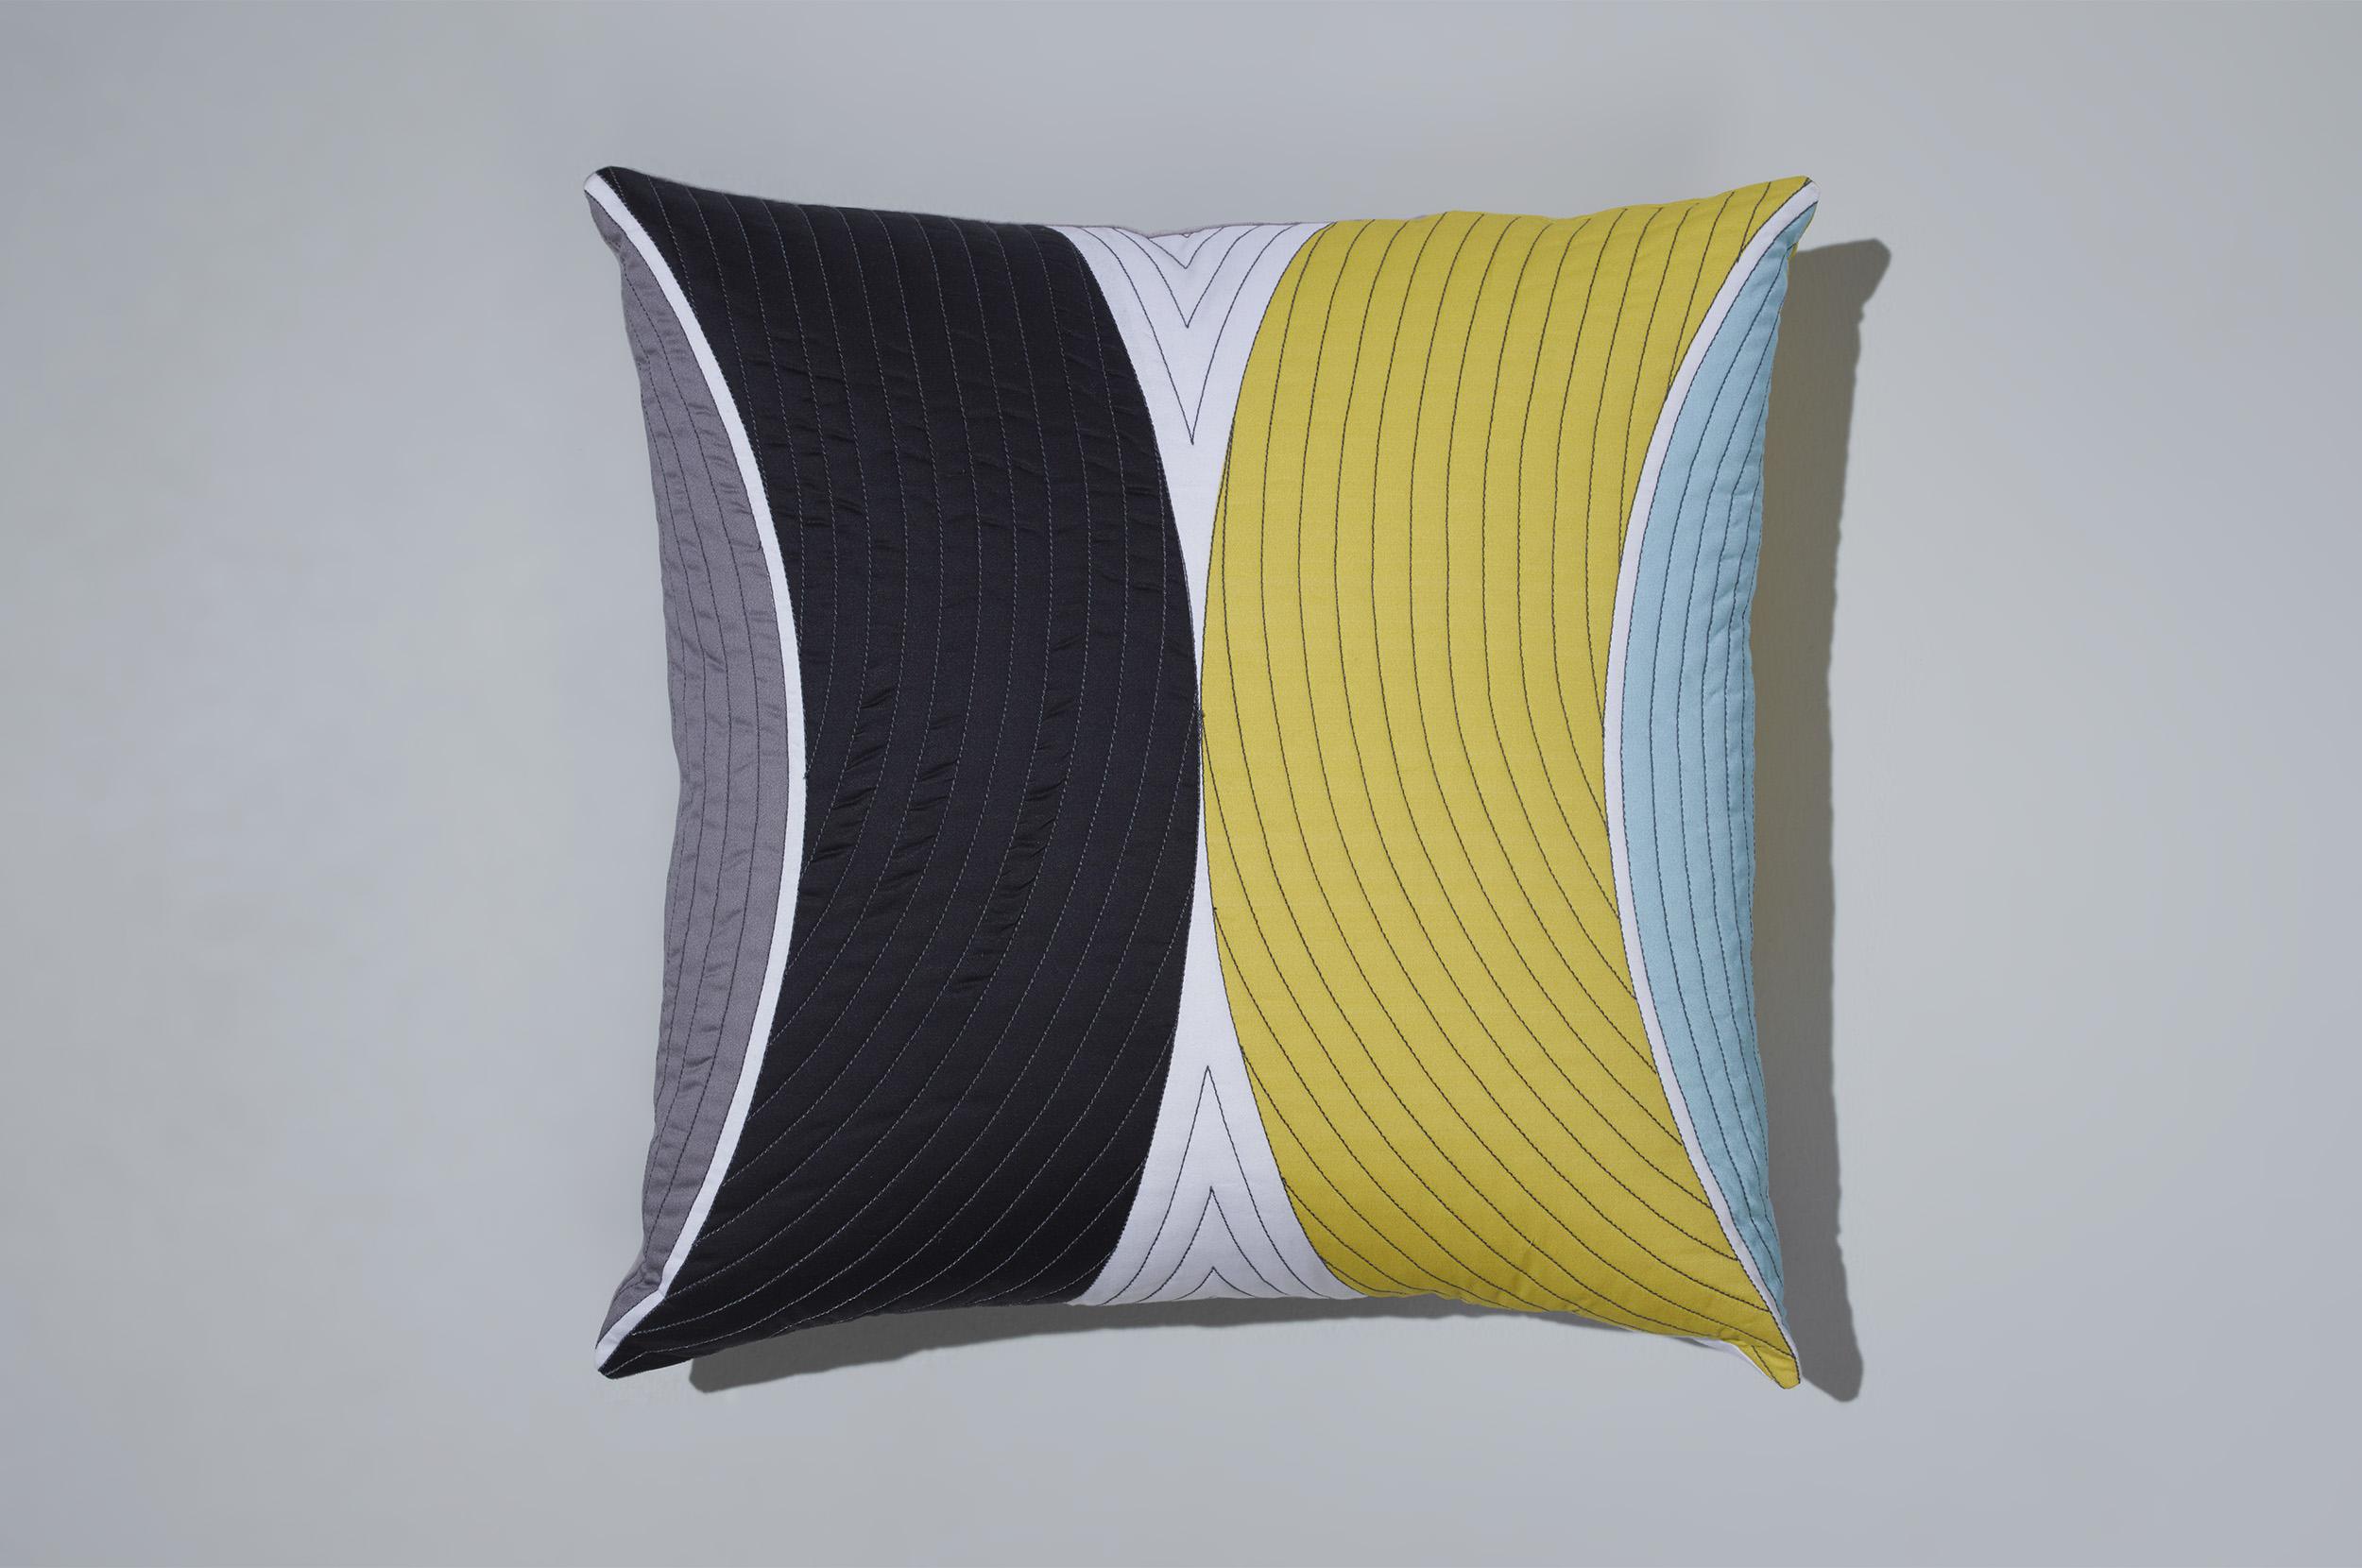 PostAndGleam_Pillows_GreyBlackChartreuseSkyBlue_COMP_Oa_FL2500.JPG